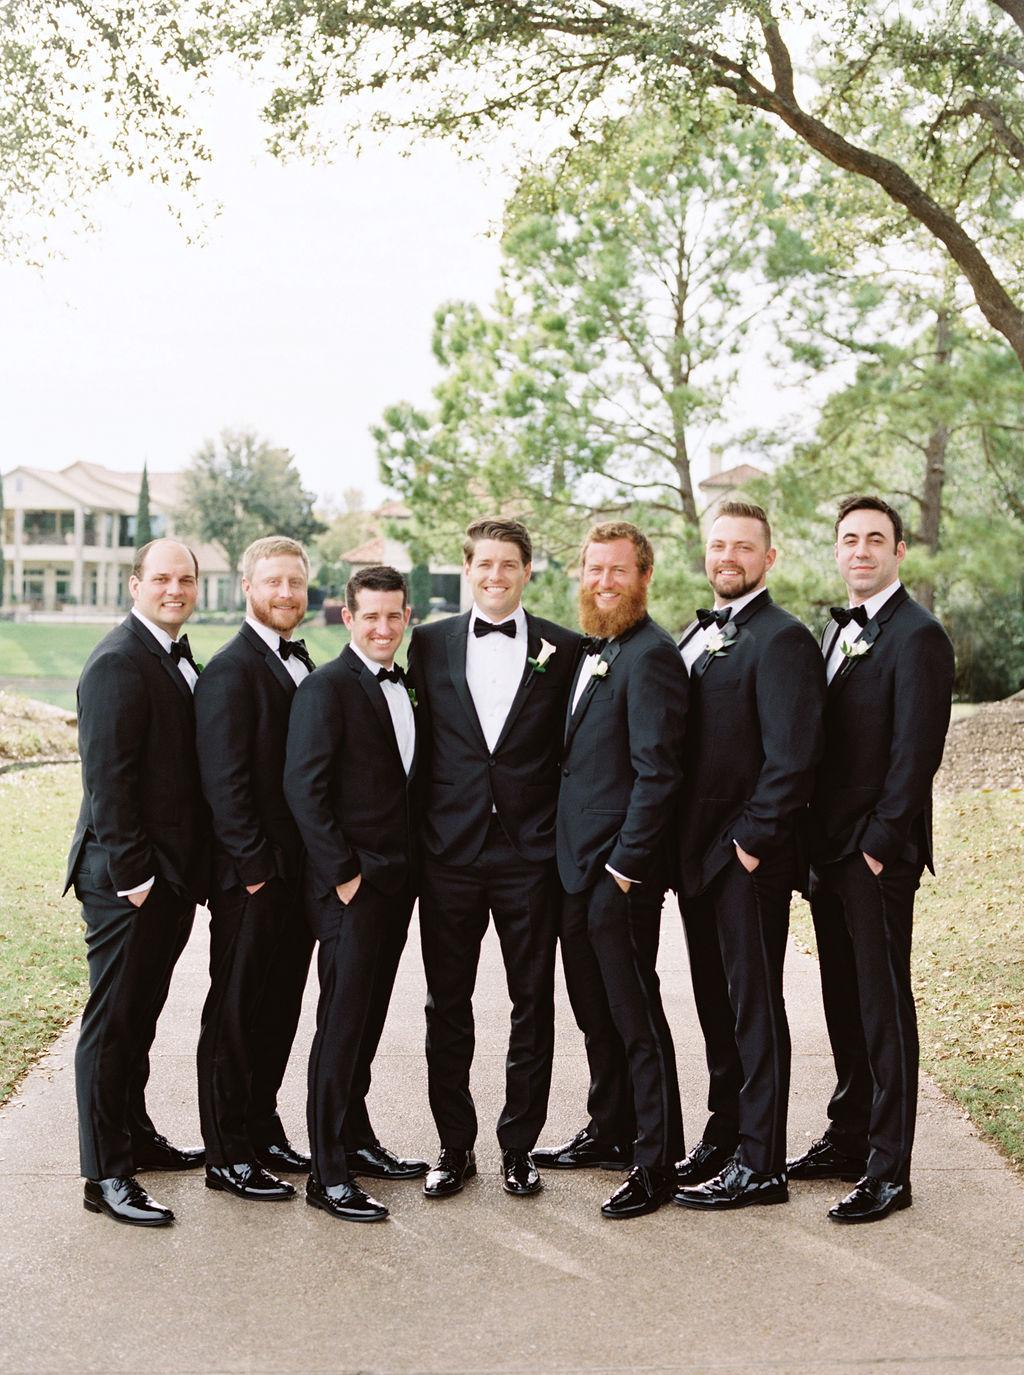 Austin-Film-Wedding-Photographer-Royal-Oaks-Country-Club-26.jpg